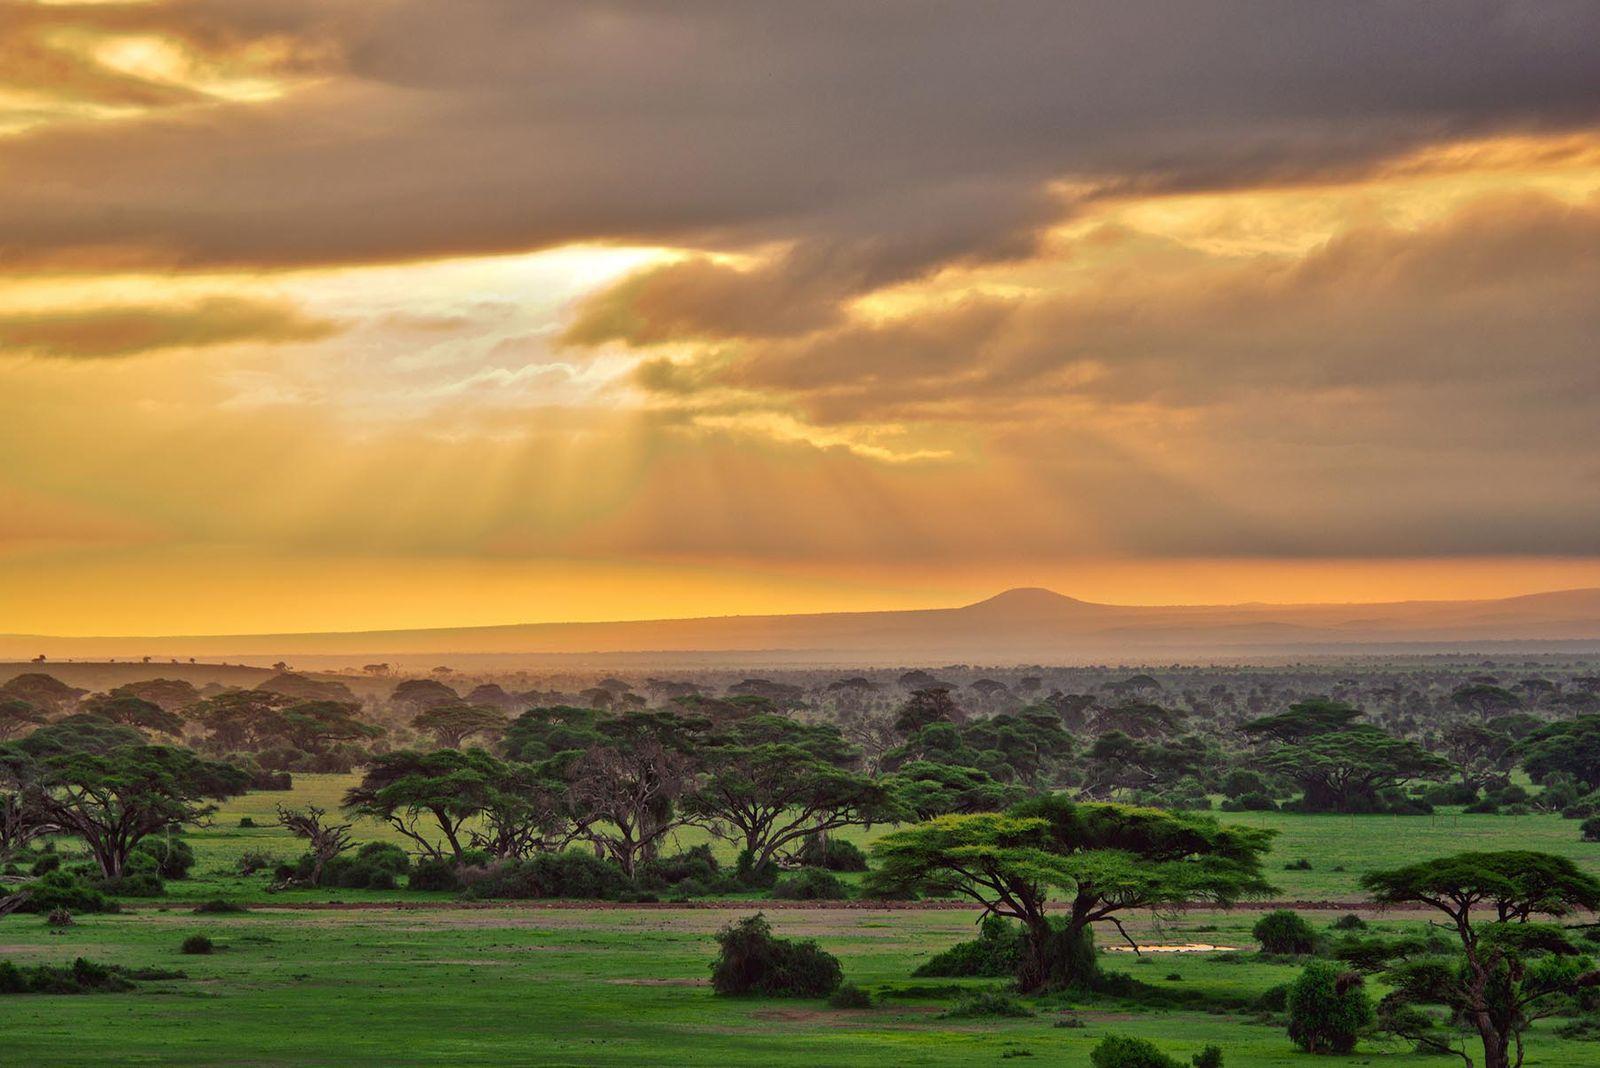 11 DAYS BEST OF KENYA & TANZANIA